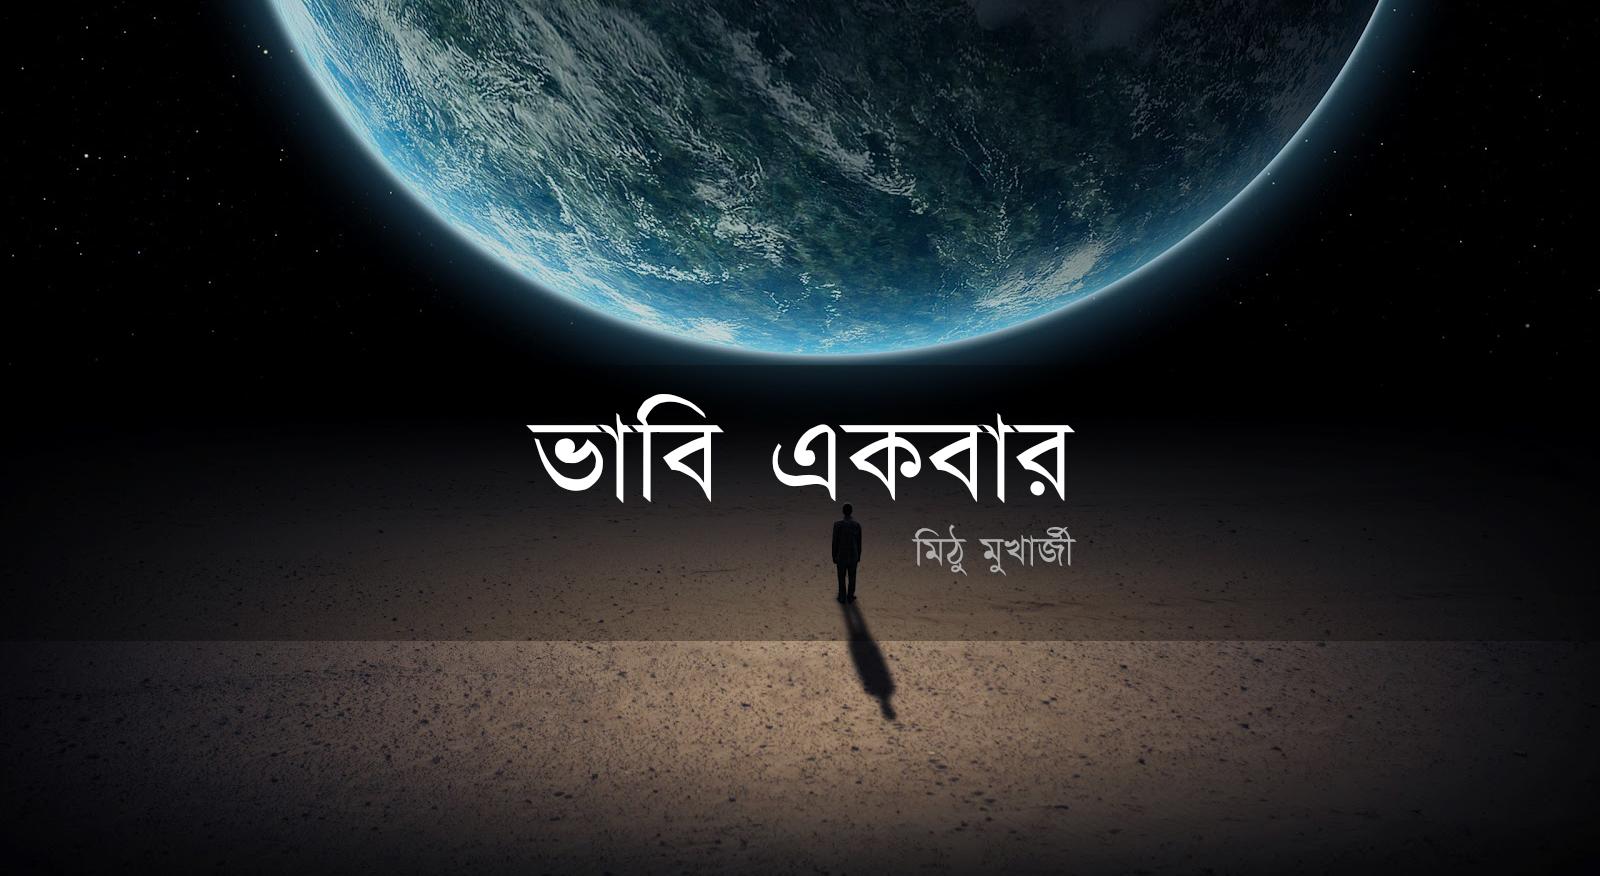 Bangla Kobita : ভাবি একবার - মিঠু মুখার্জী | Bengali Poem : Bhabi Ekbar - Mithu Mukherjee | DjM Originals